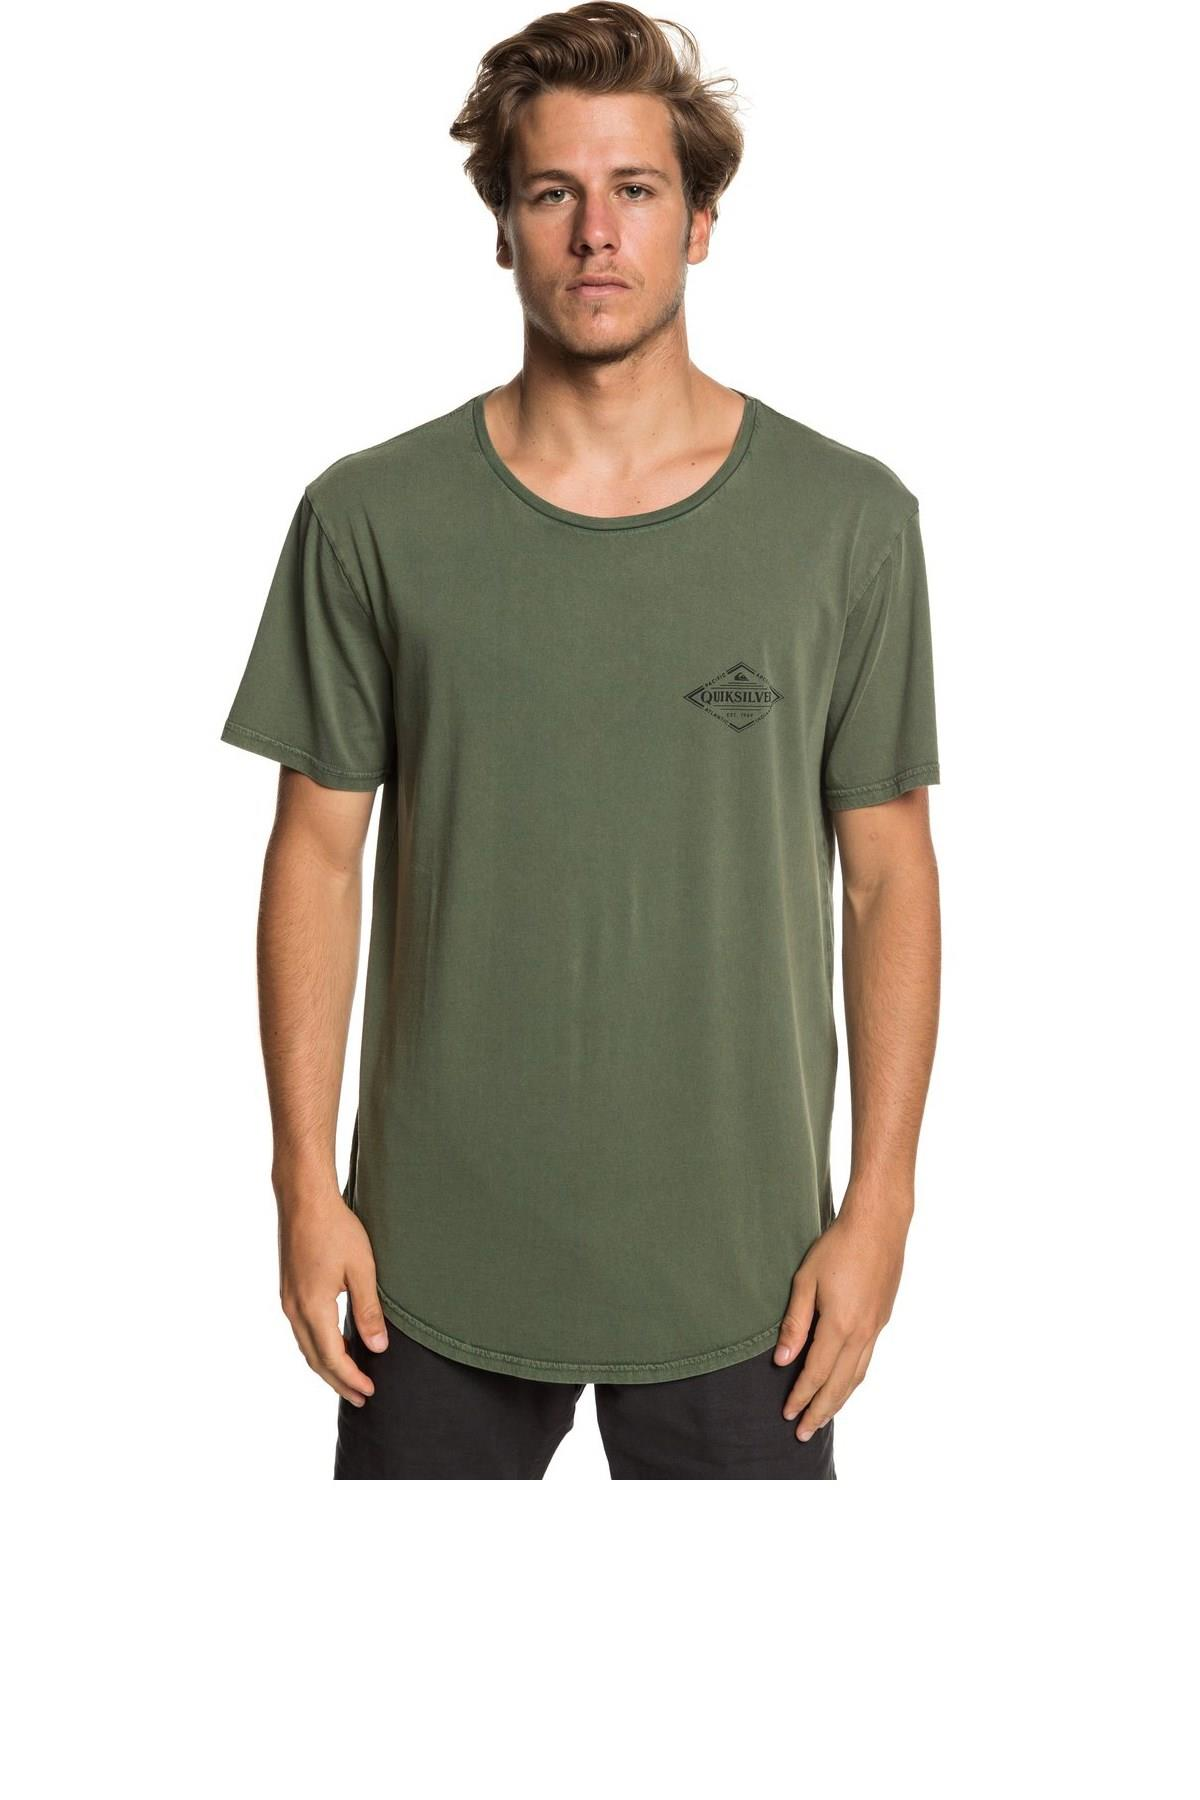 Quiksilver Diamondtailsss M Tees T-Shirt Qkeqyzt05233